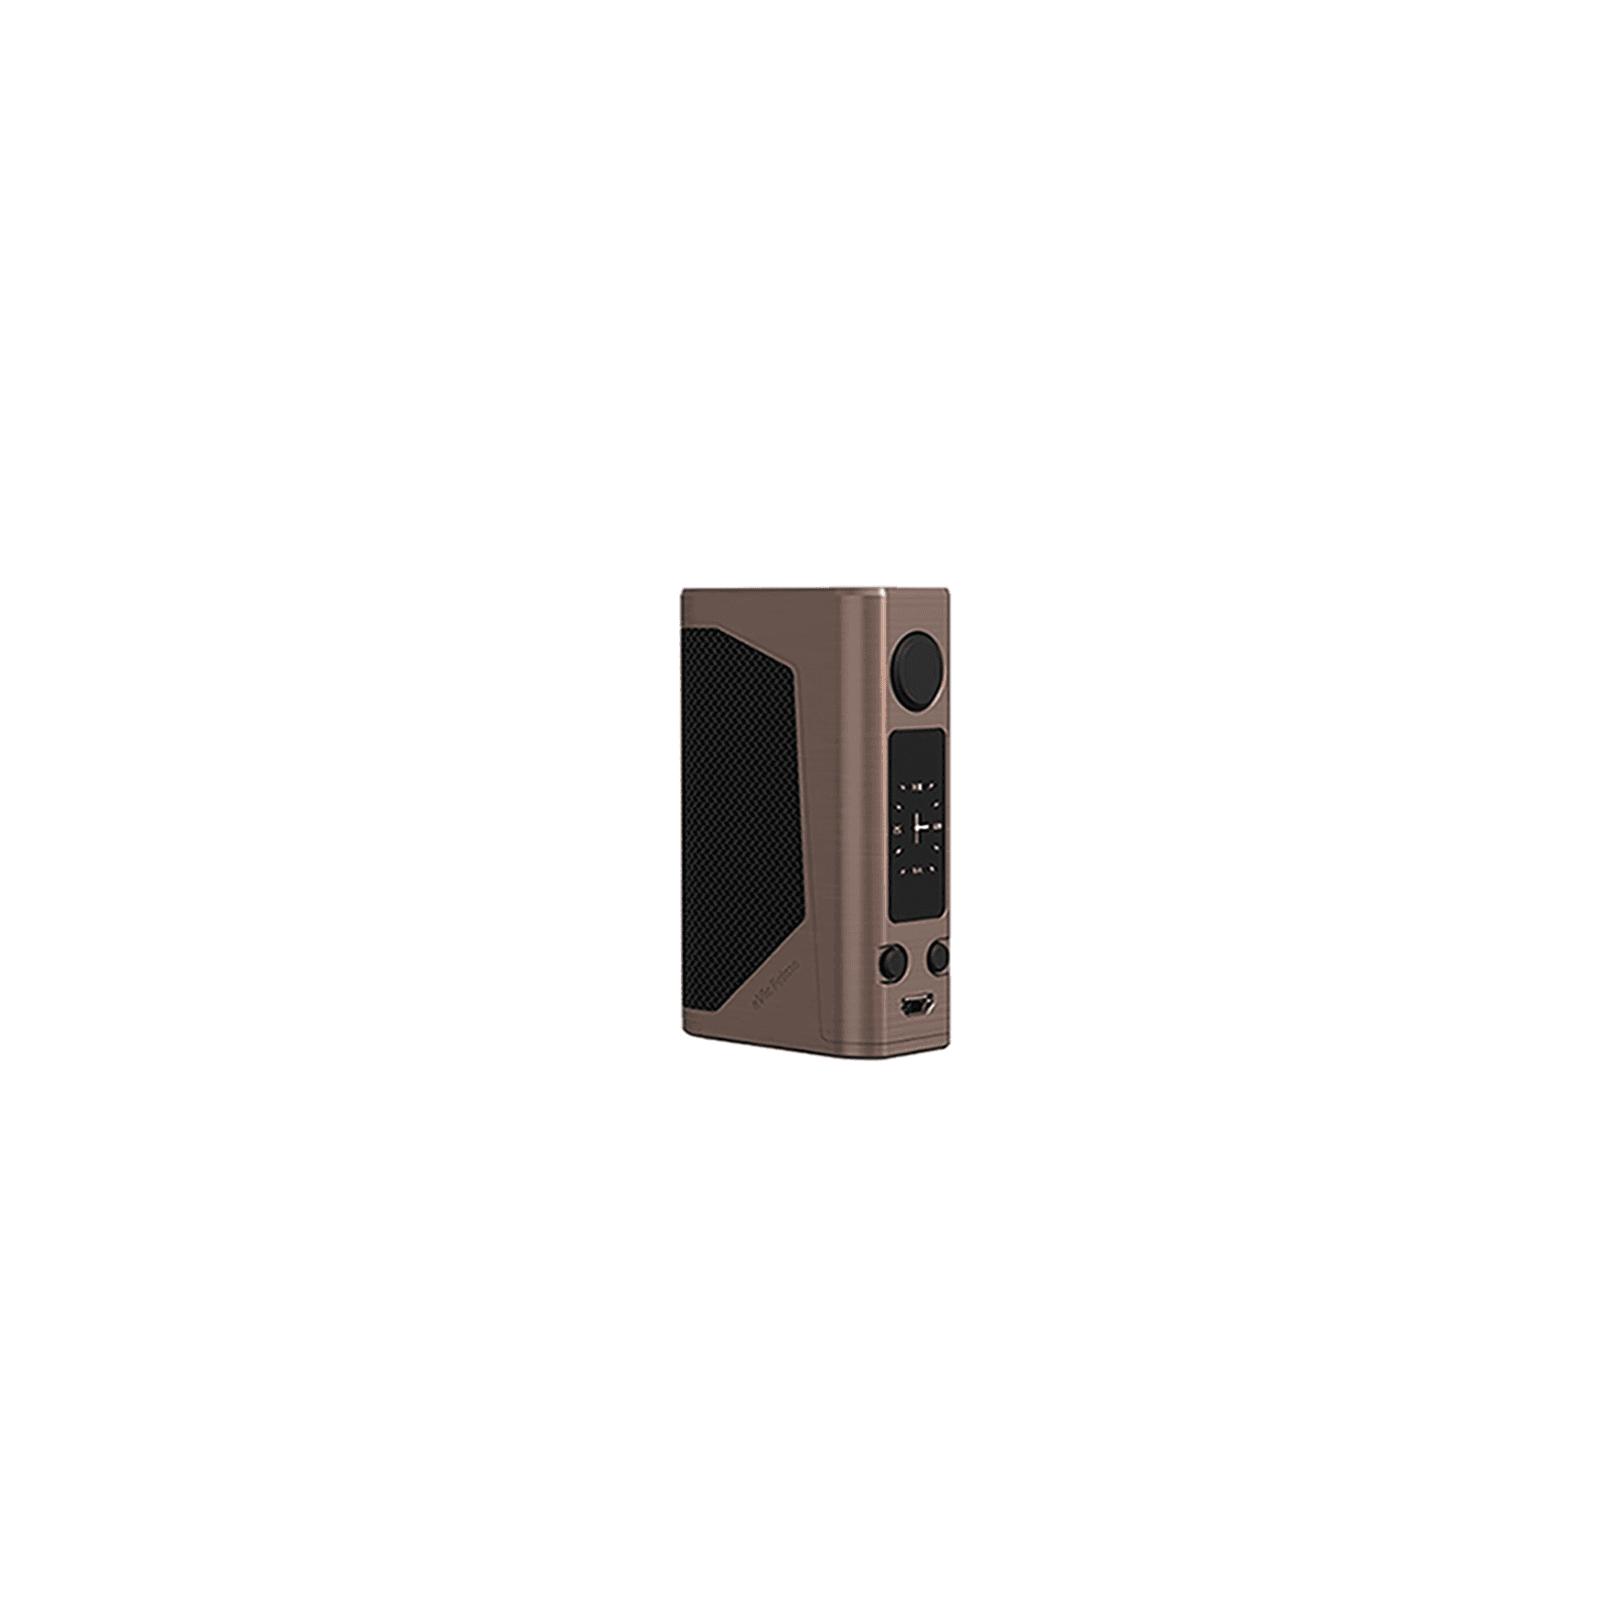 Box eVic Primo 2.0 Bronze - Joytech